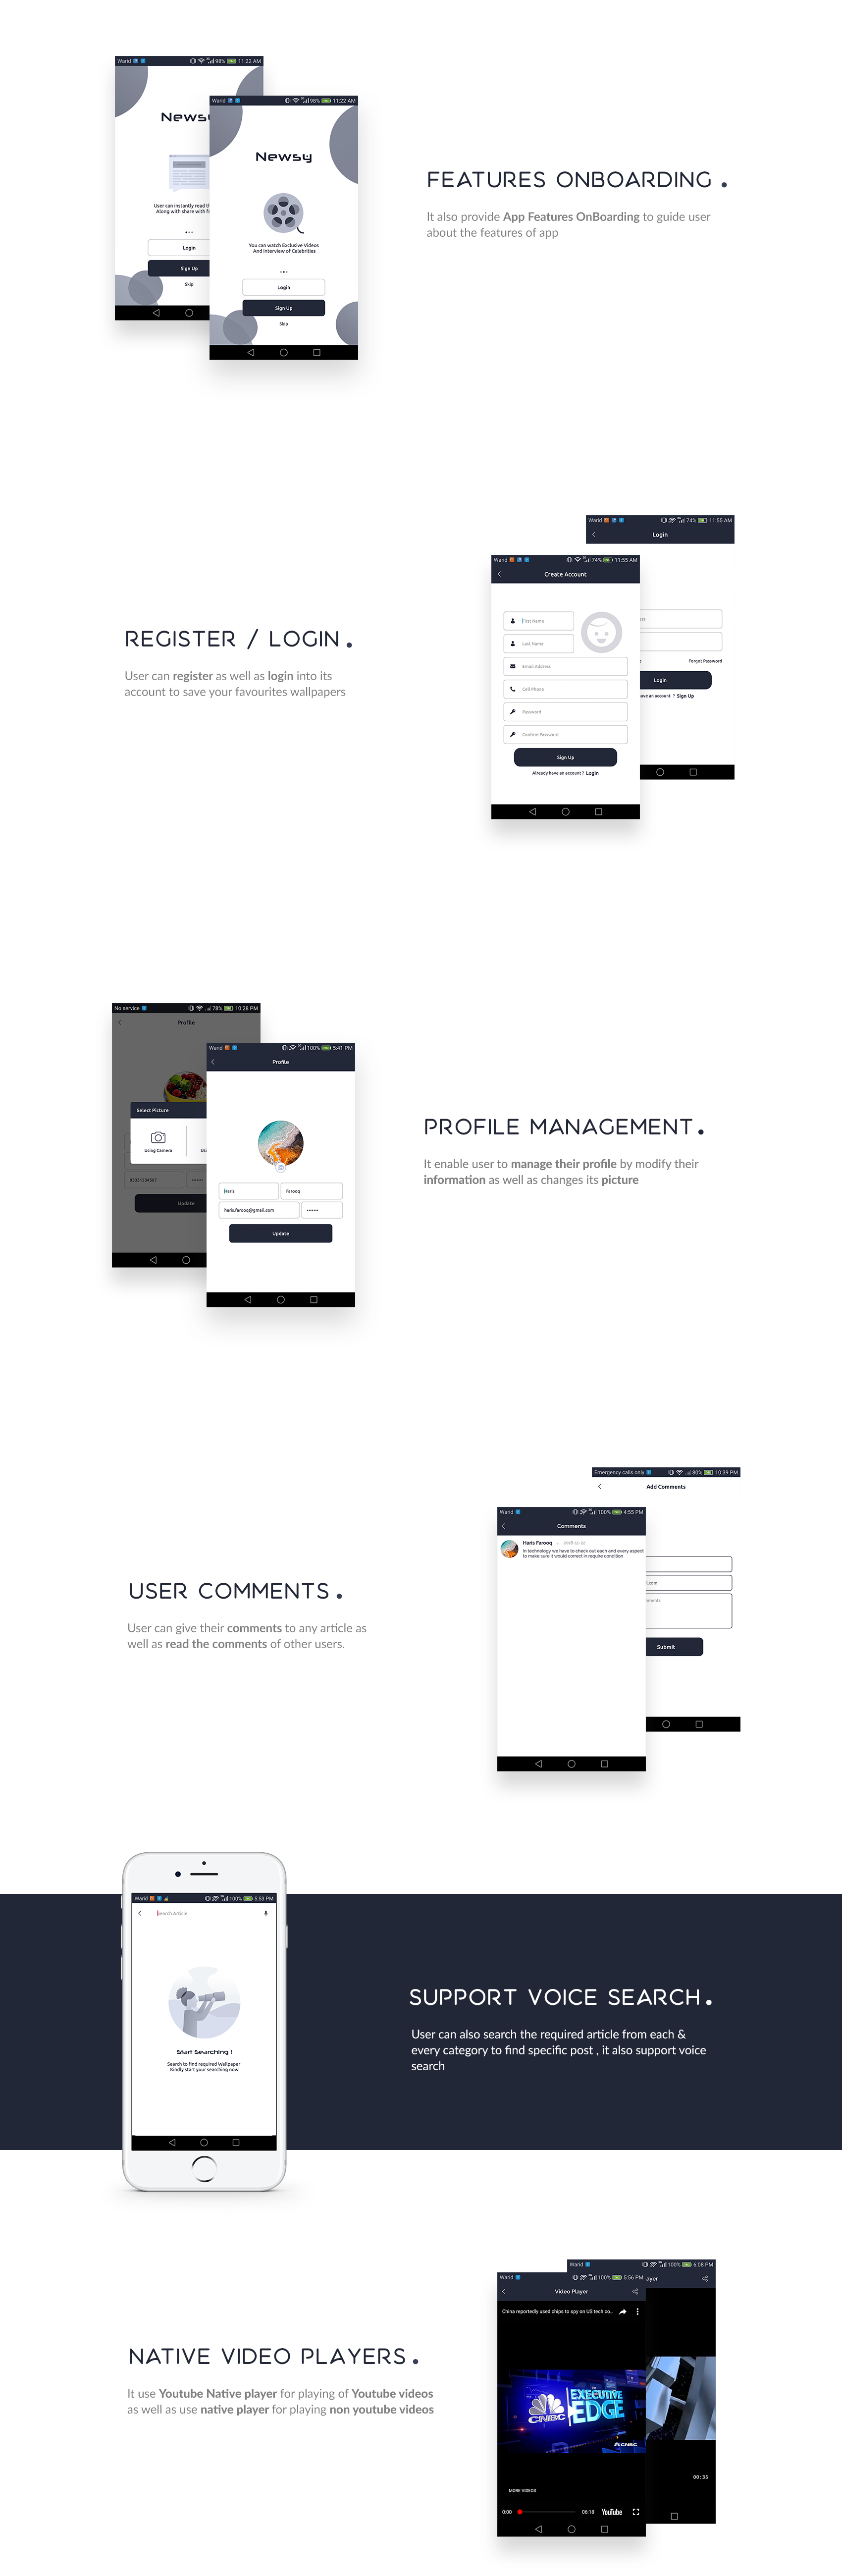 Newsy - Full Featured Native WordPress App - 2